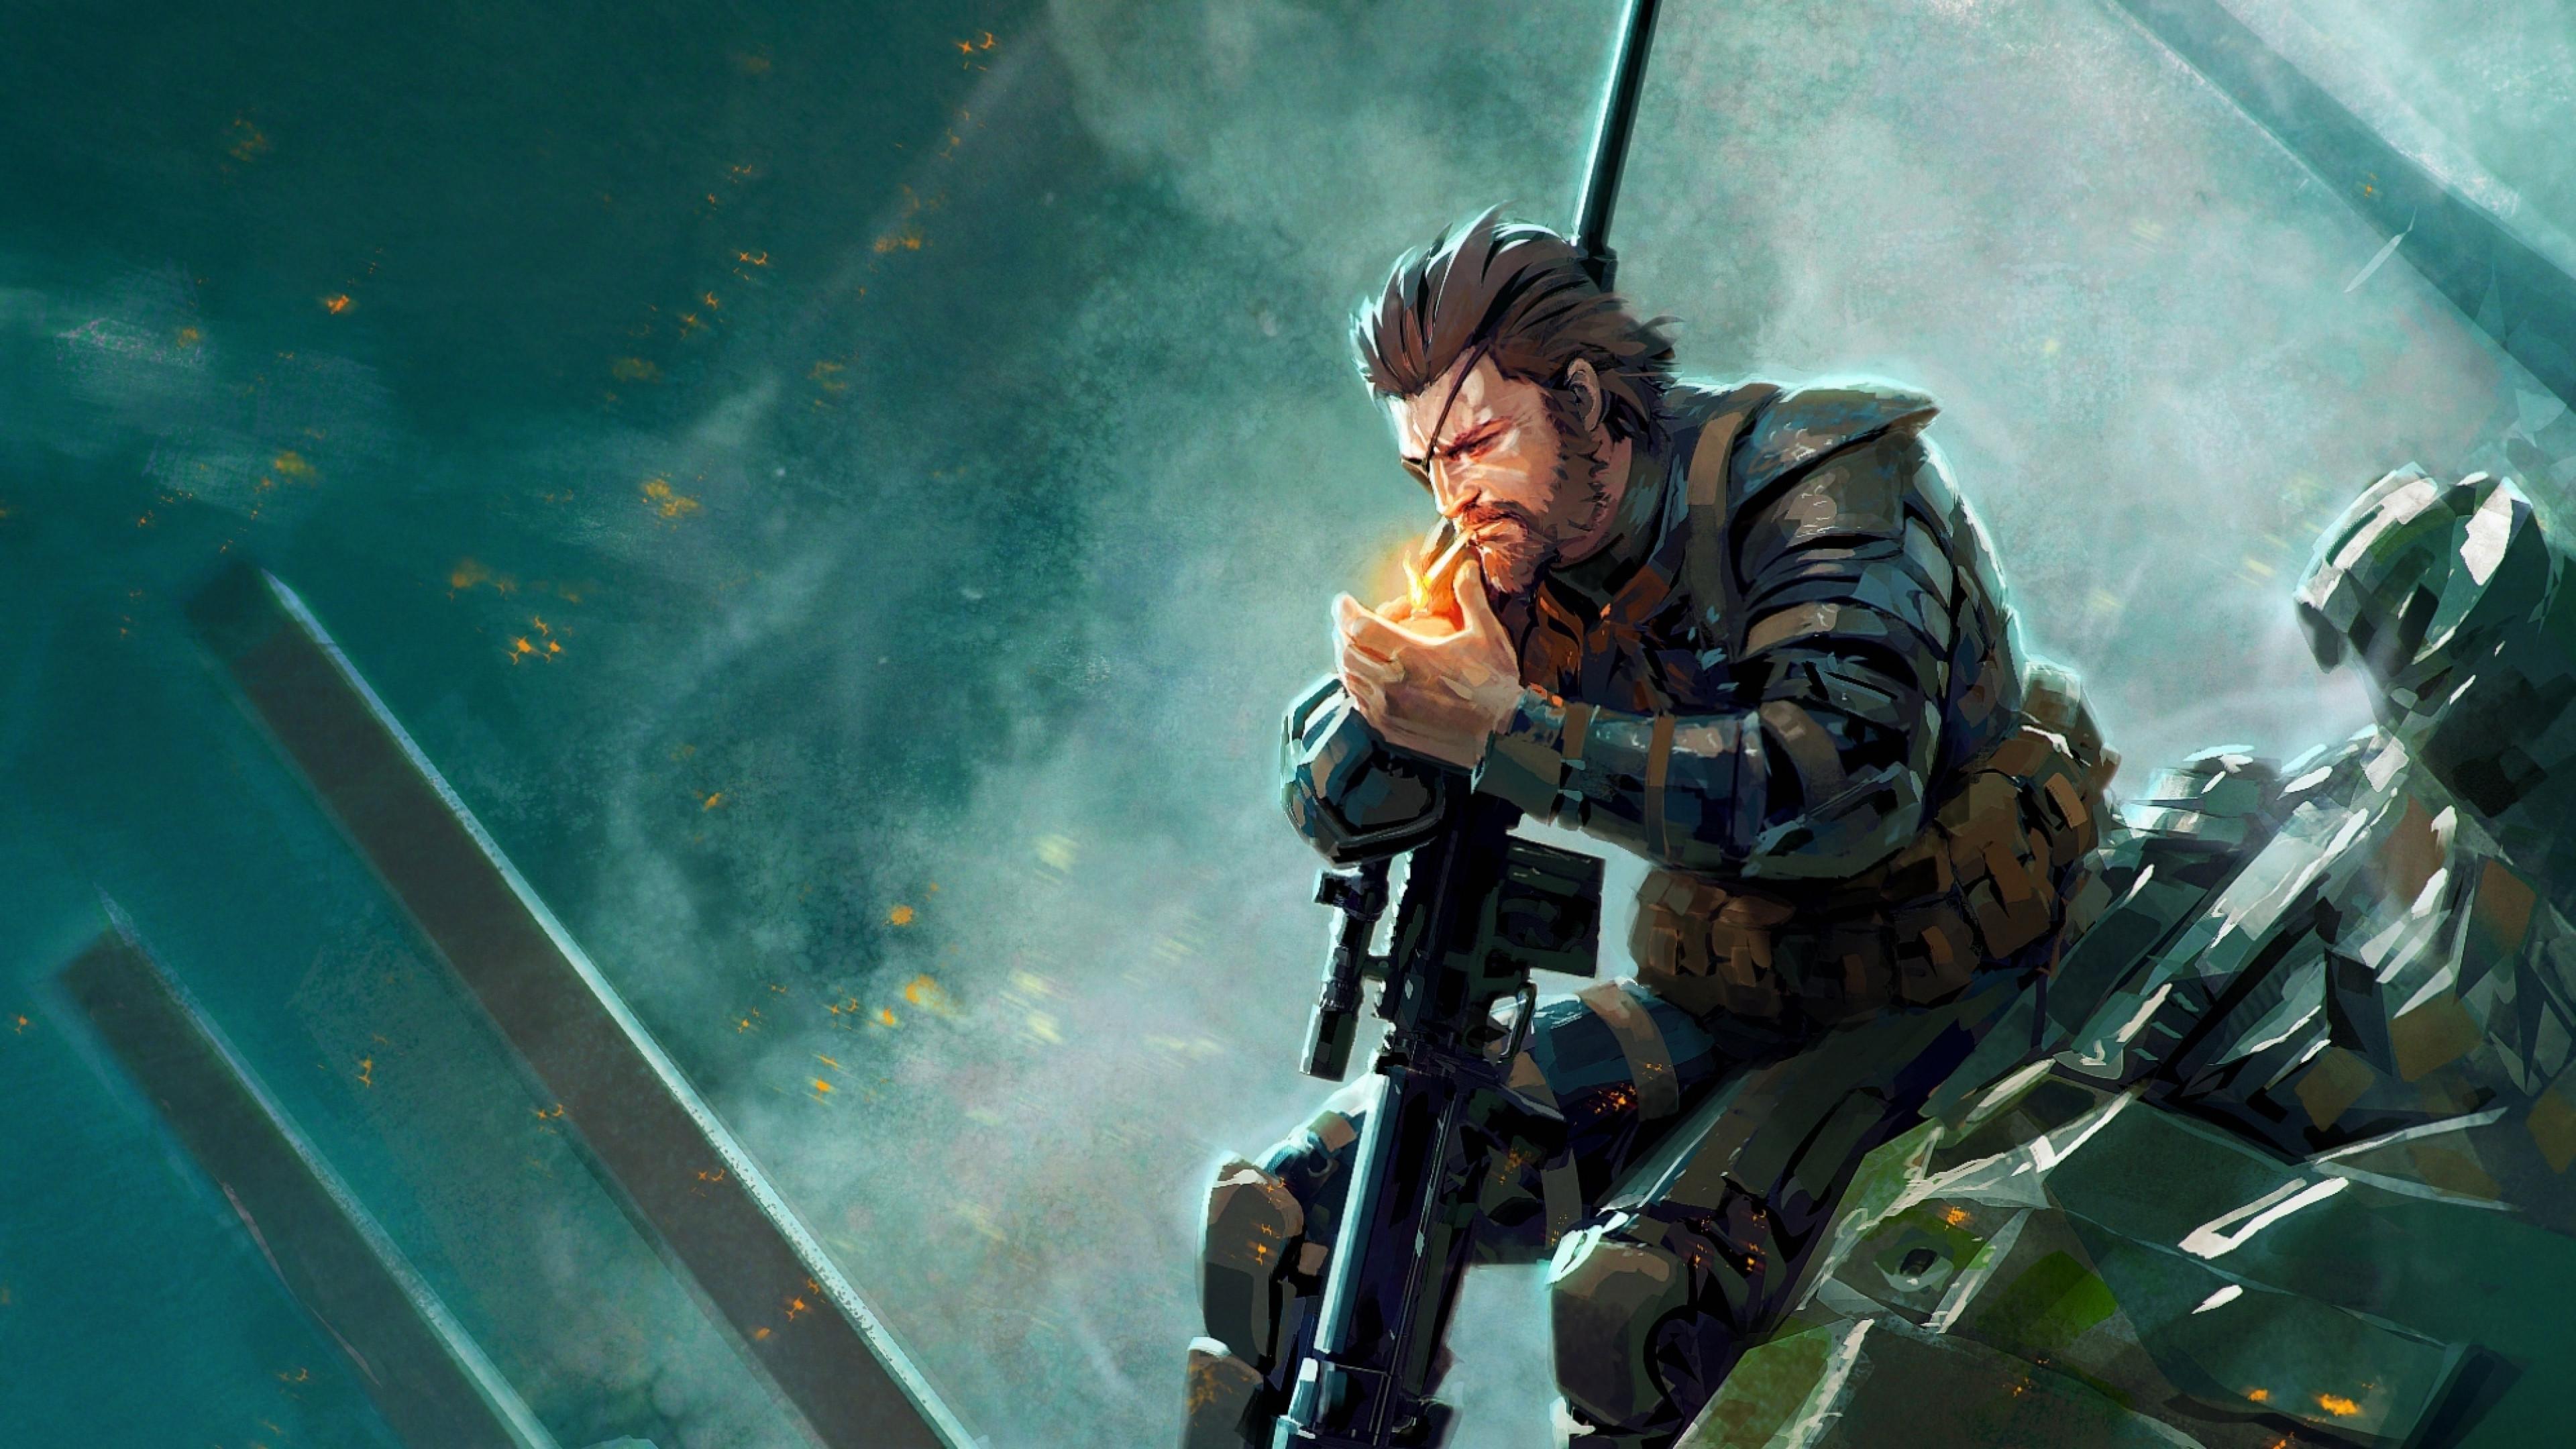 Metal Gear Wallpapers (76+ images)